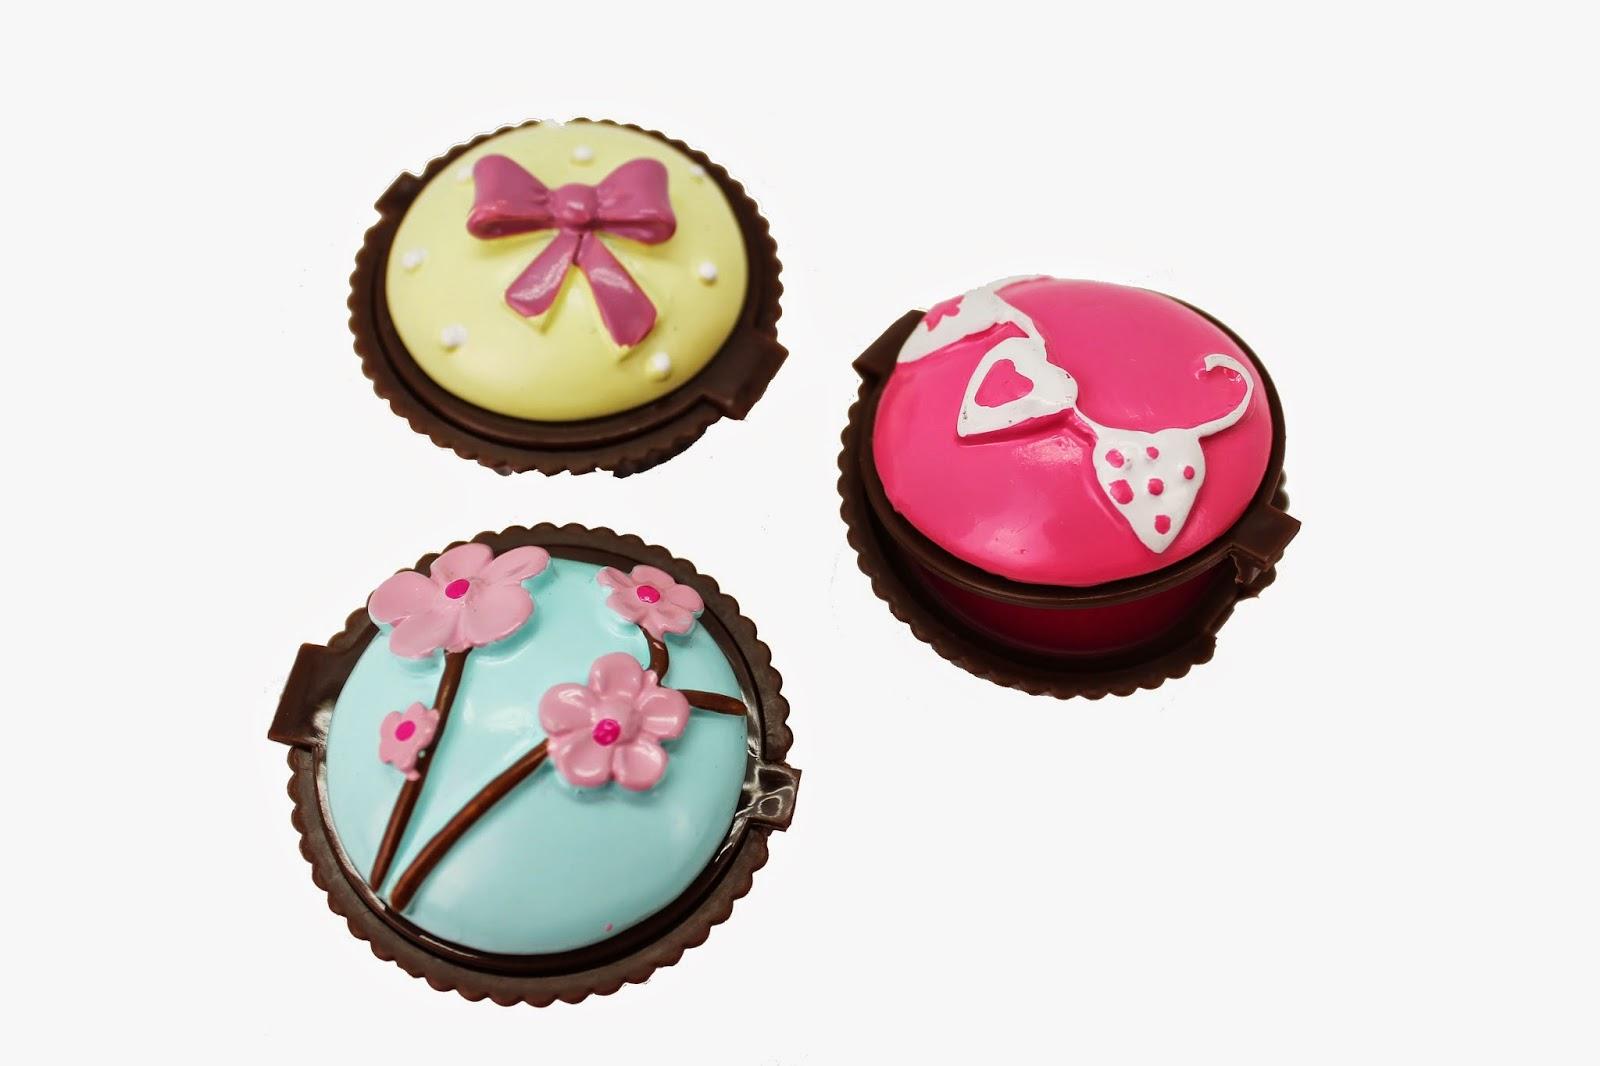 http://latiendadekloe.es/para-ellas/283-muffins-balsamo-labial.html